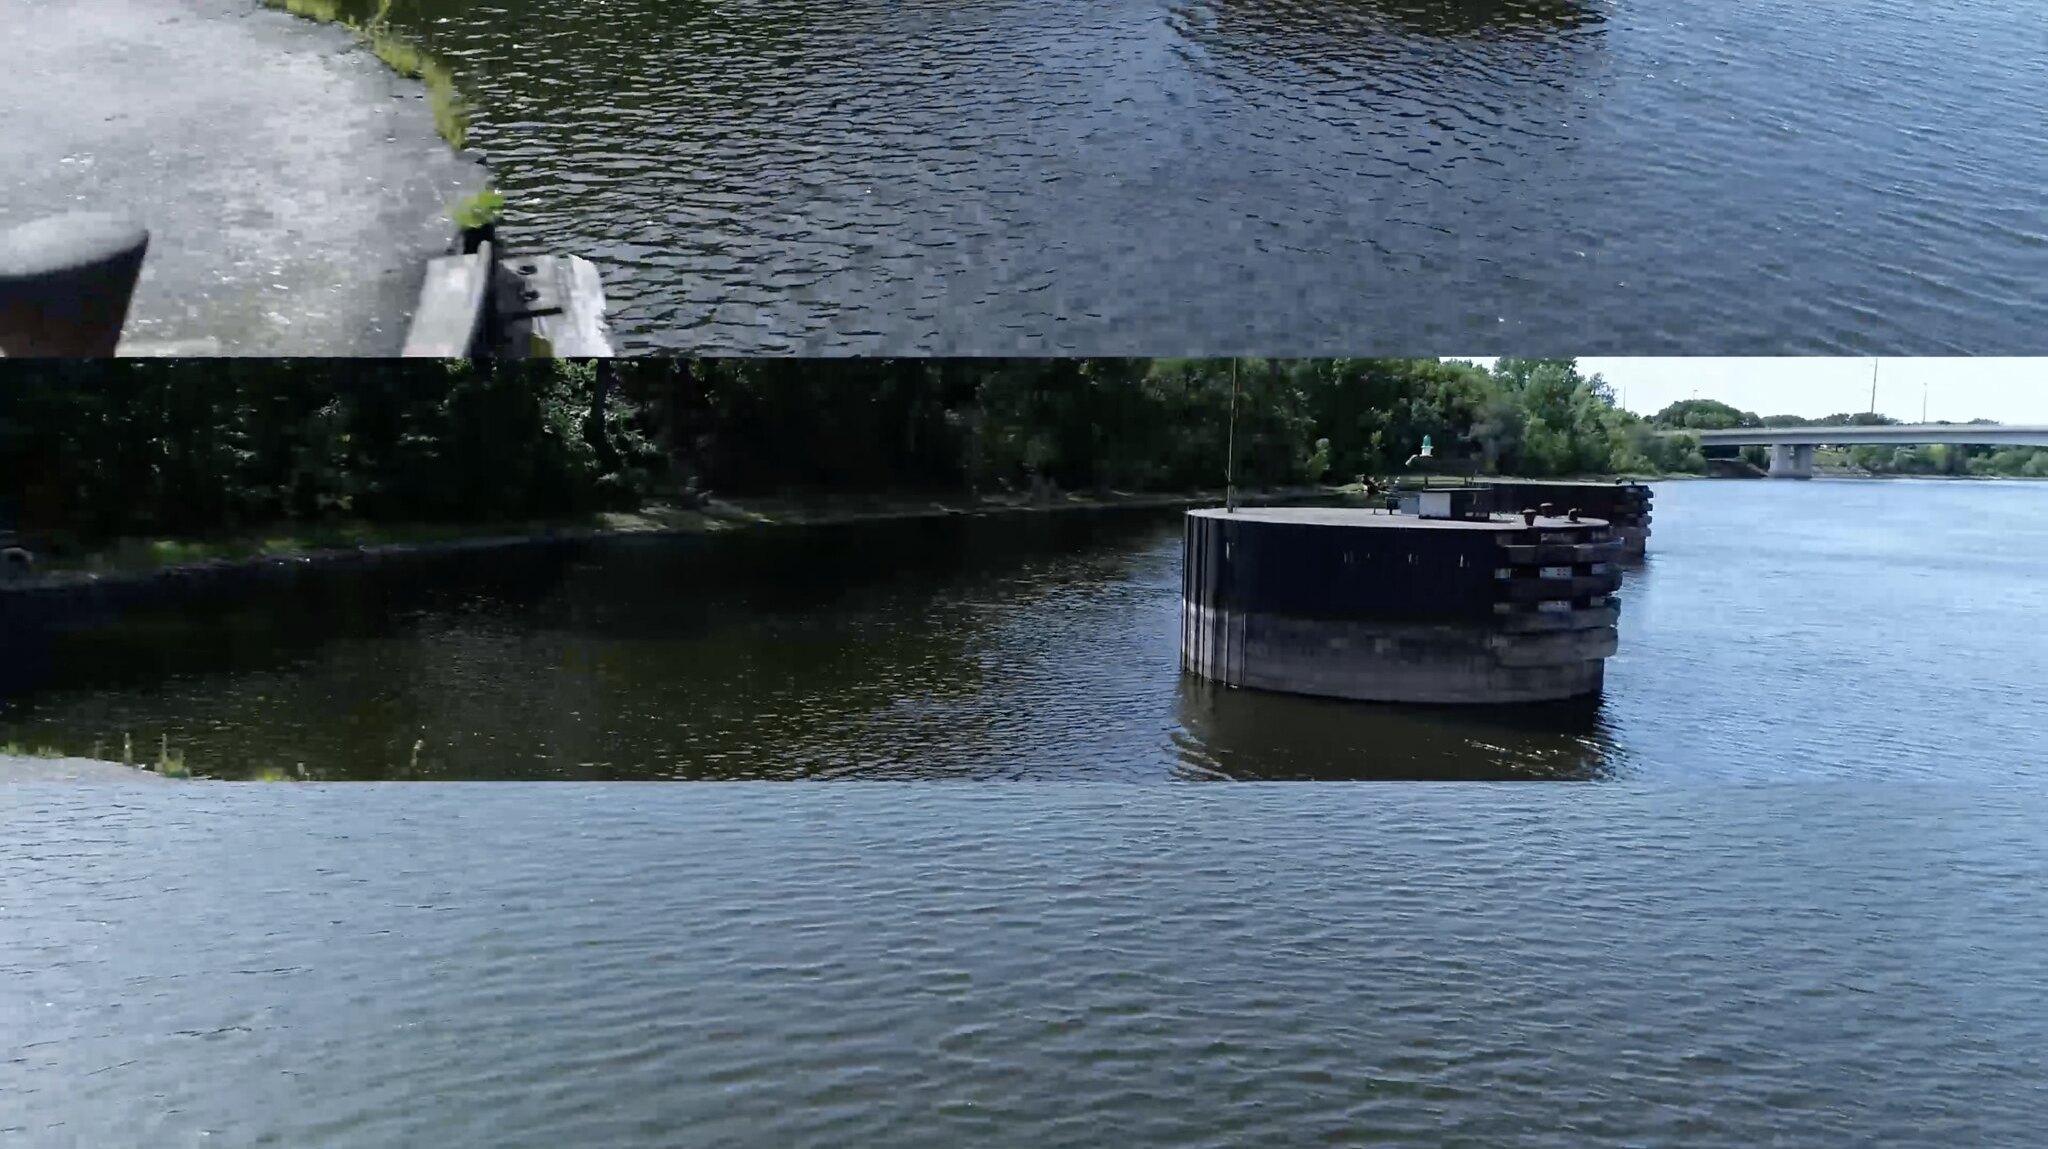 horizontal shots of the river